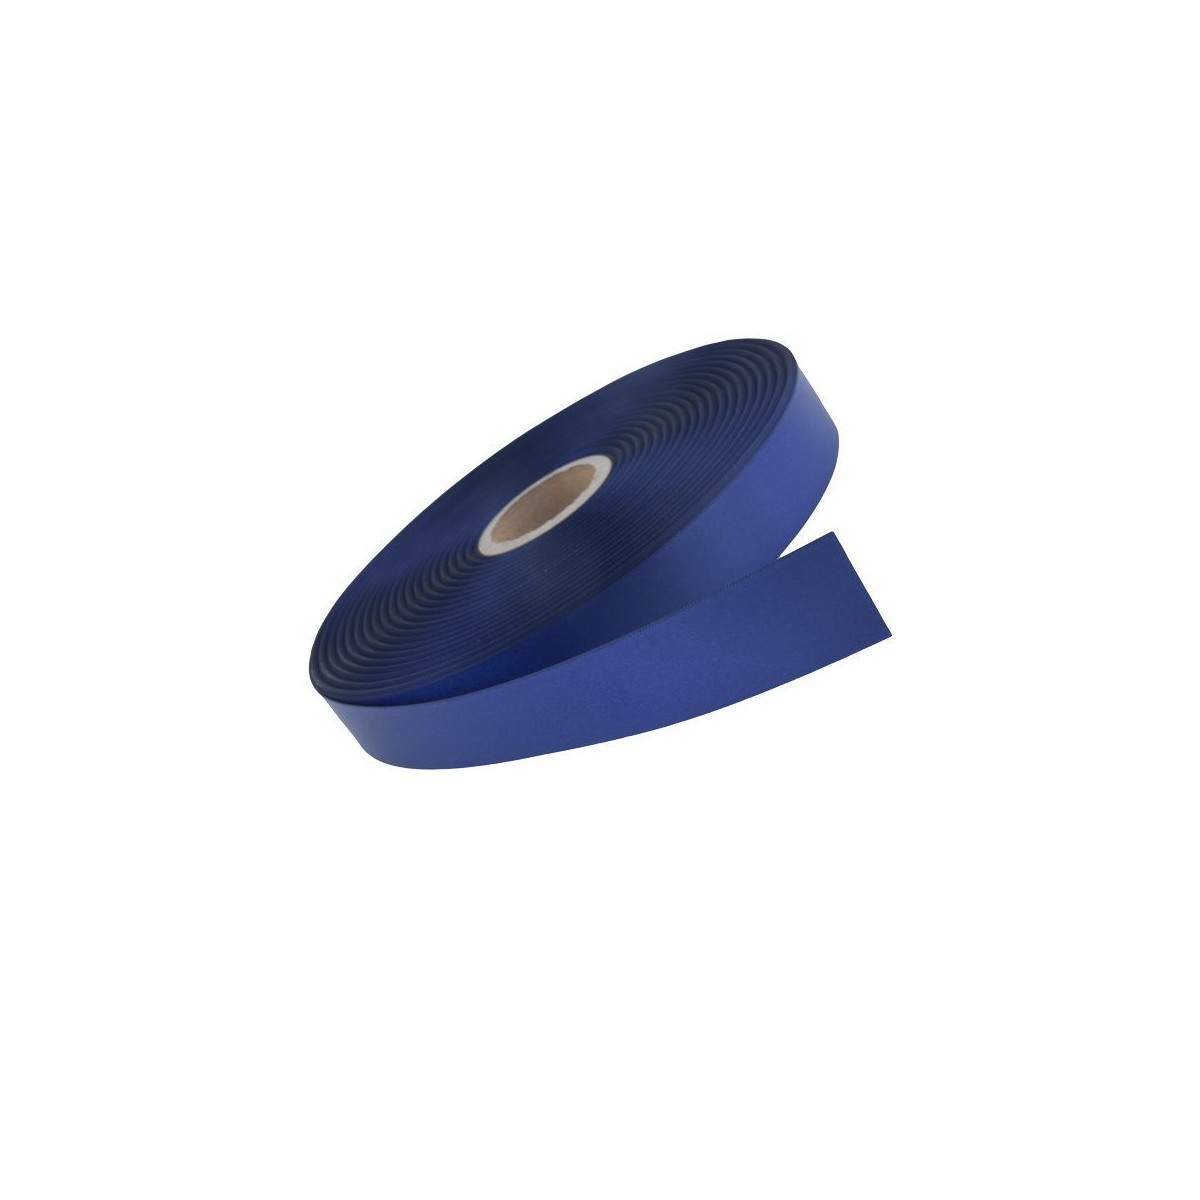 Ruban Satin Bleu Marine 6mm - 25m